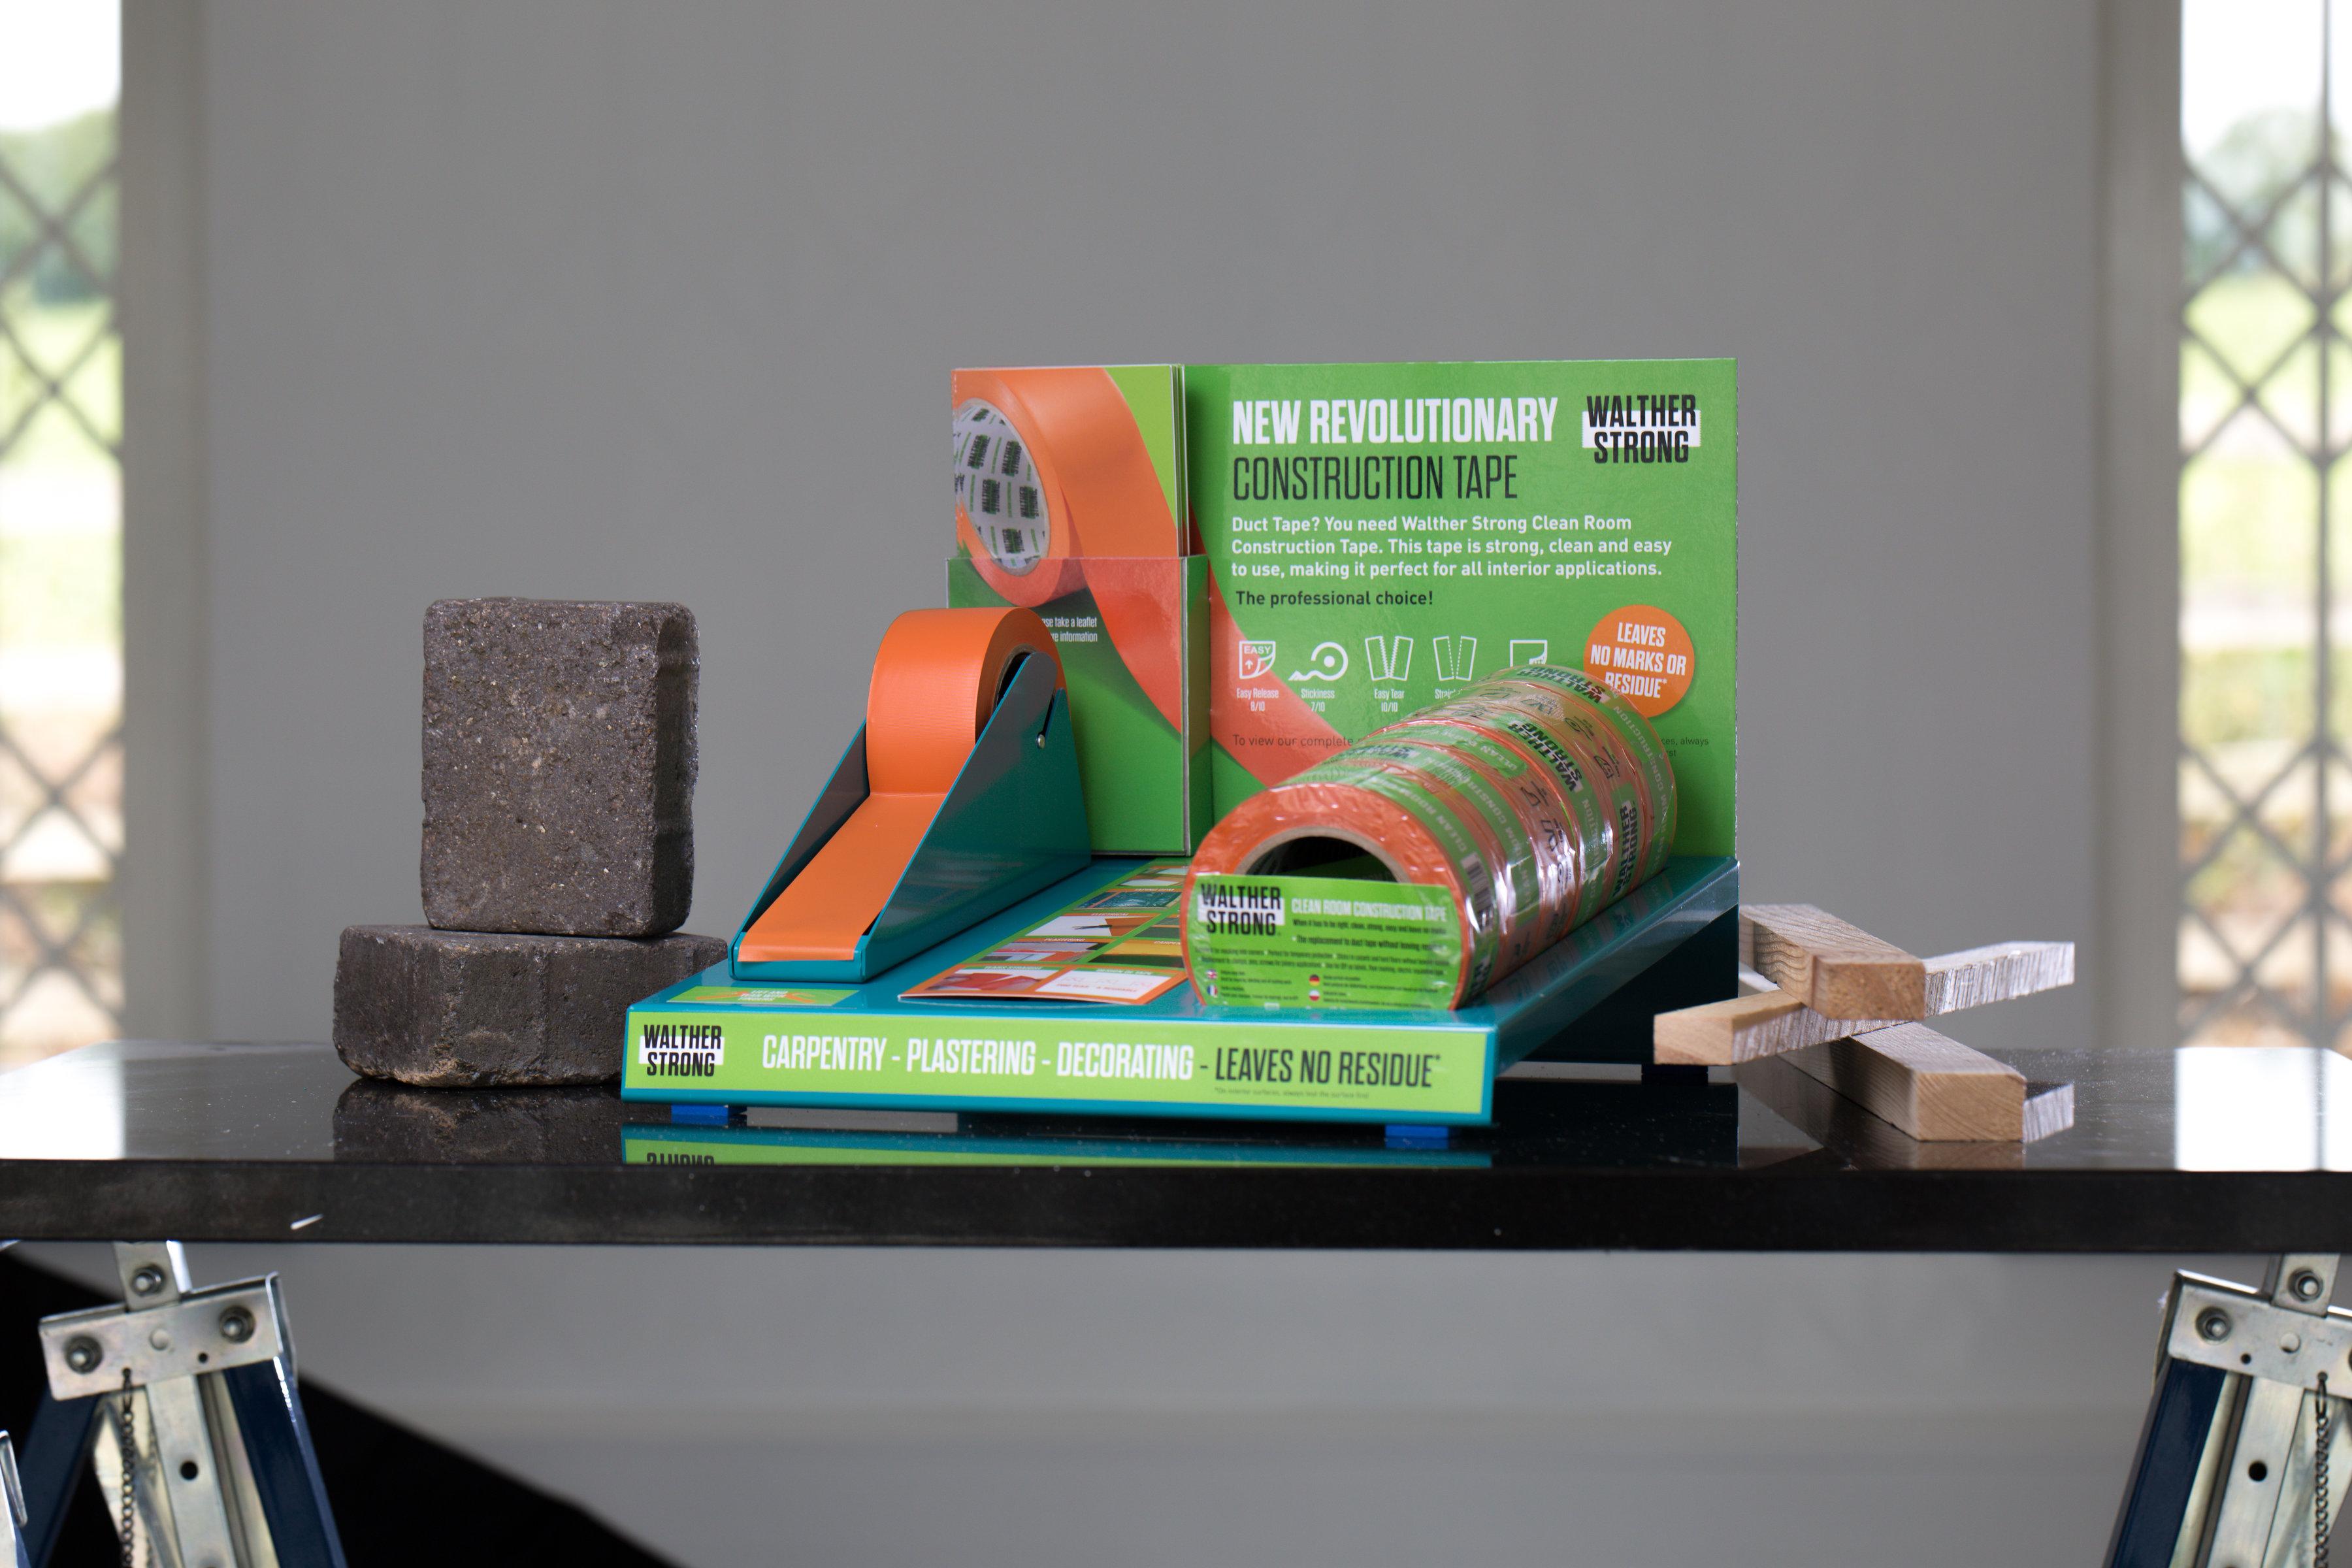 Cleanroom Construction Tape - Easy Tear, Straight Tear, No